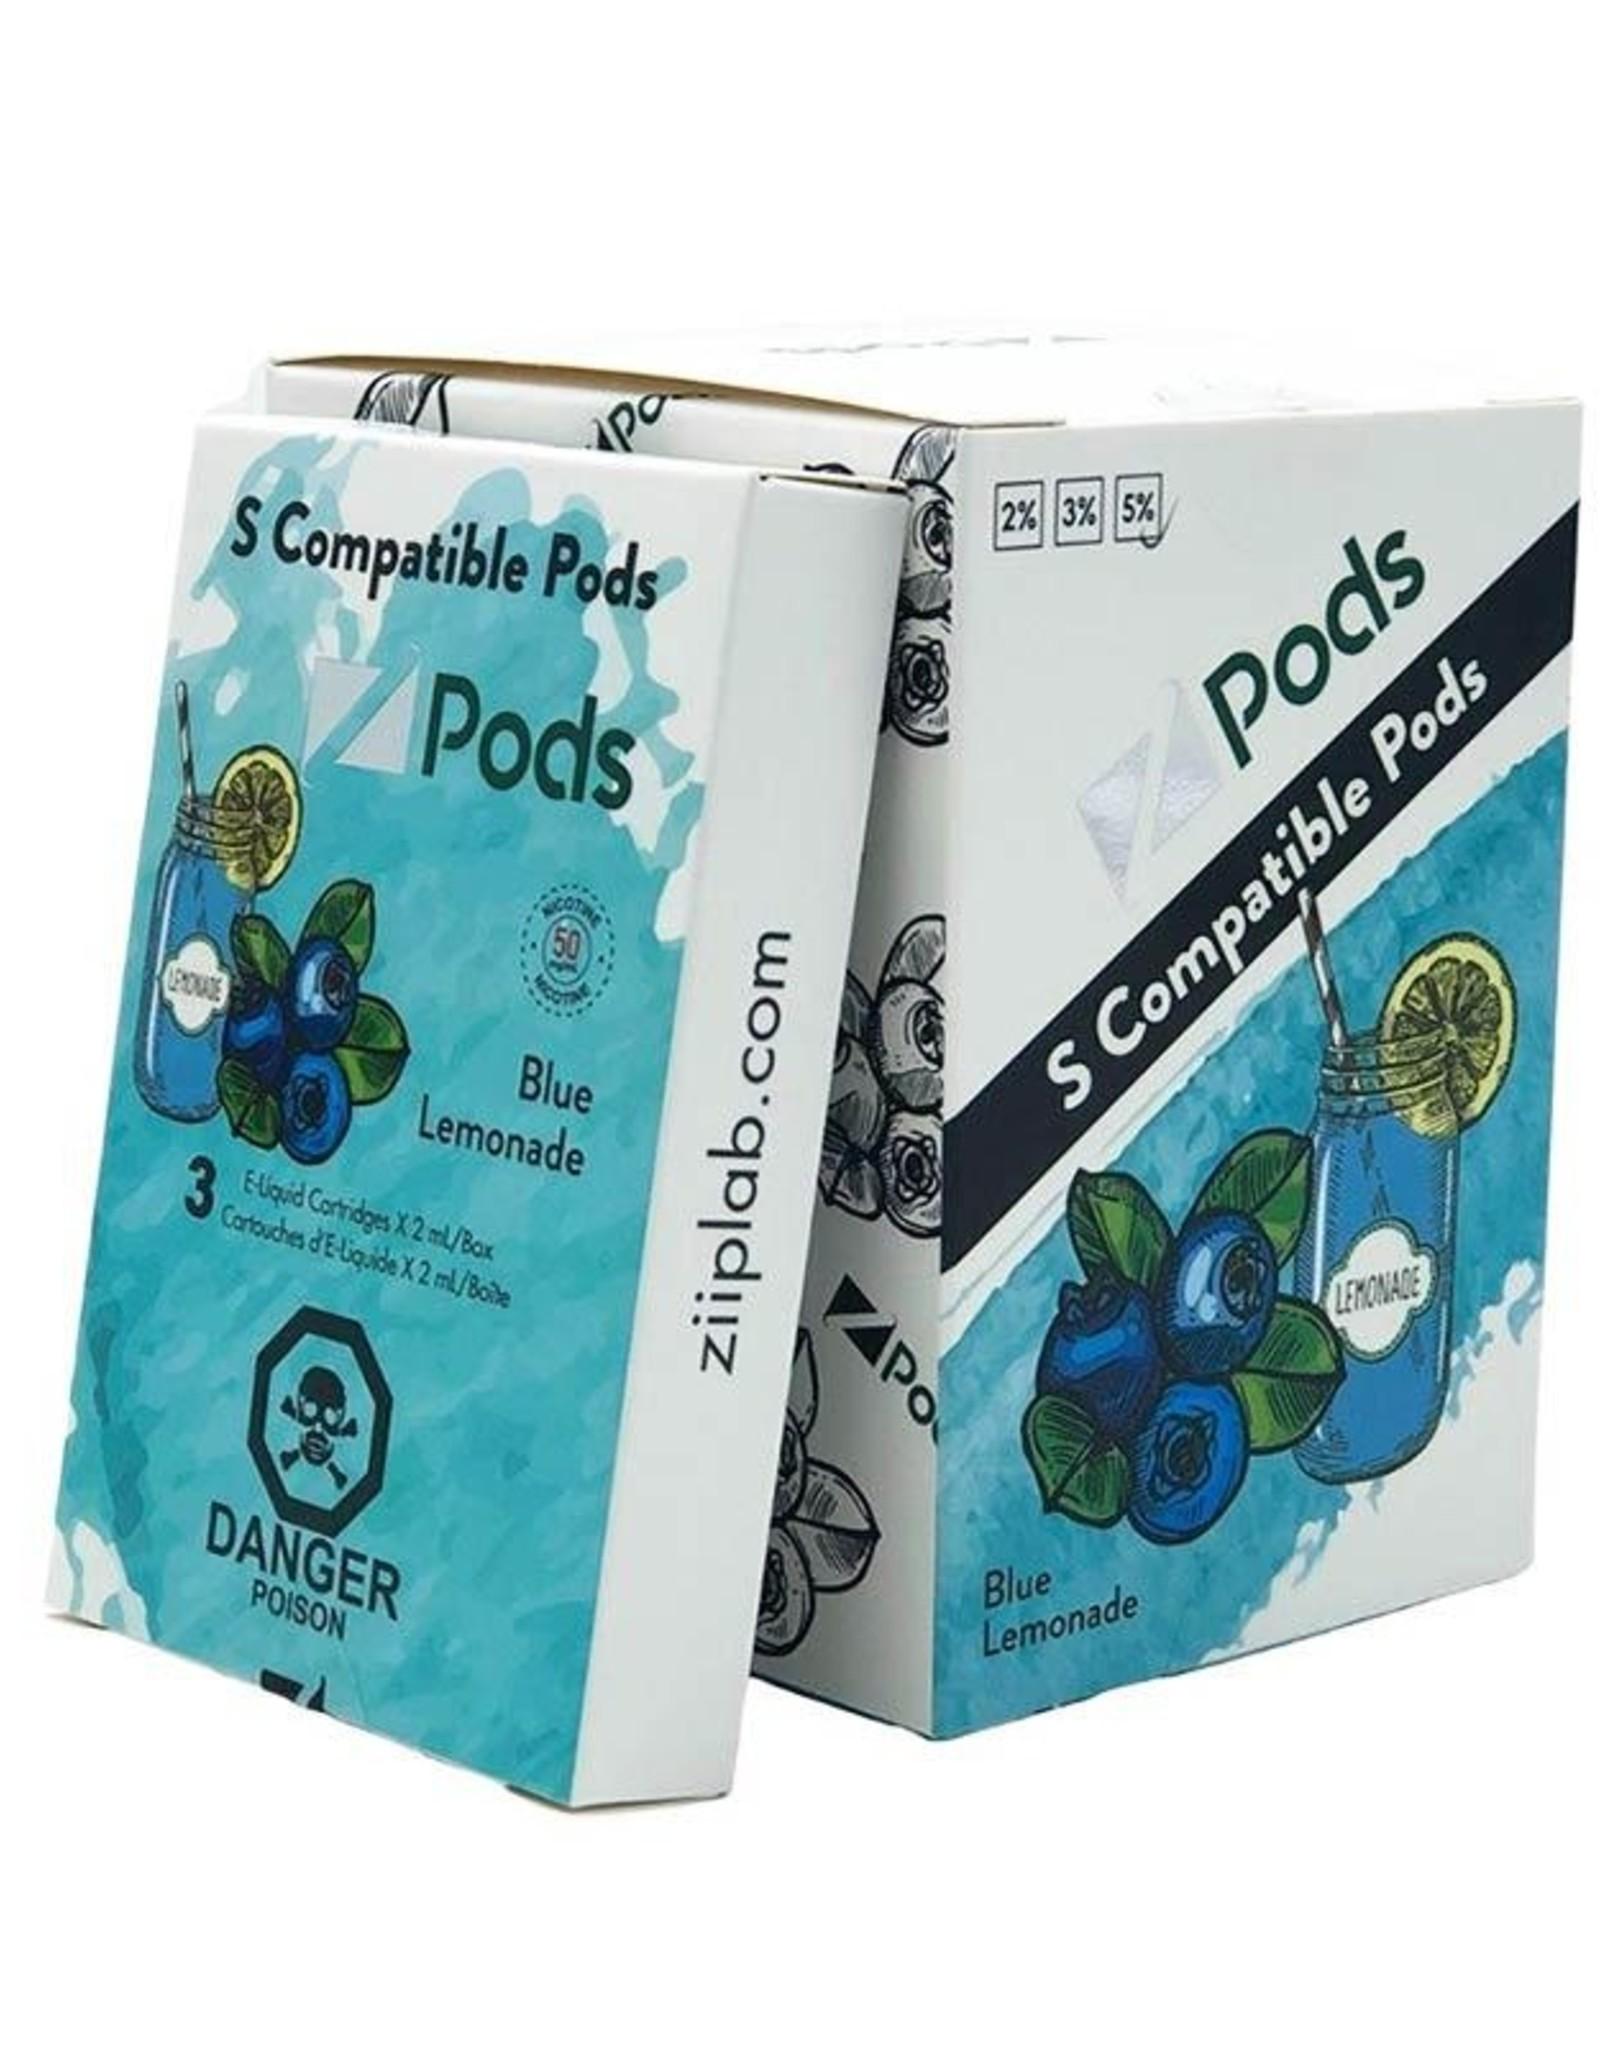 Z Pods S Compatible